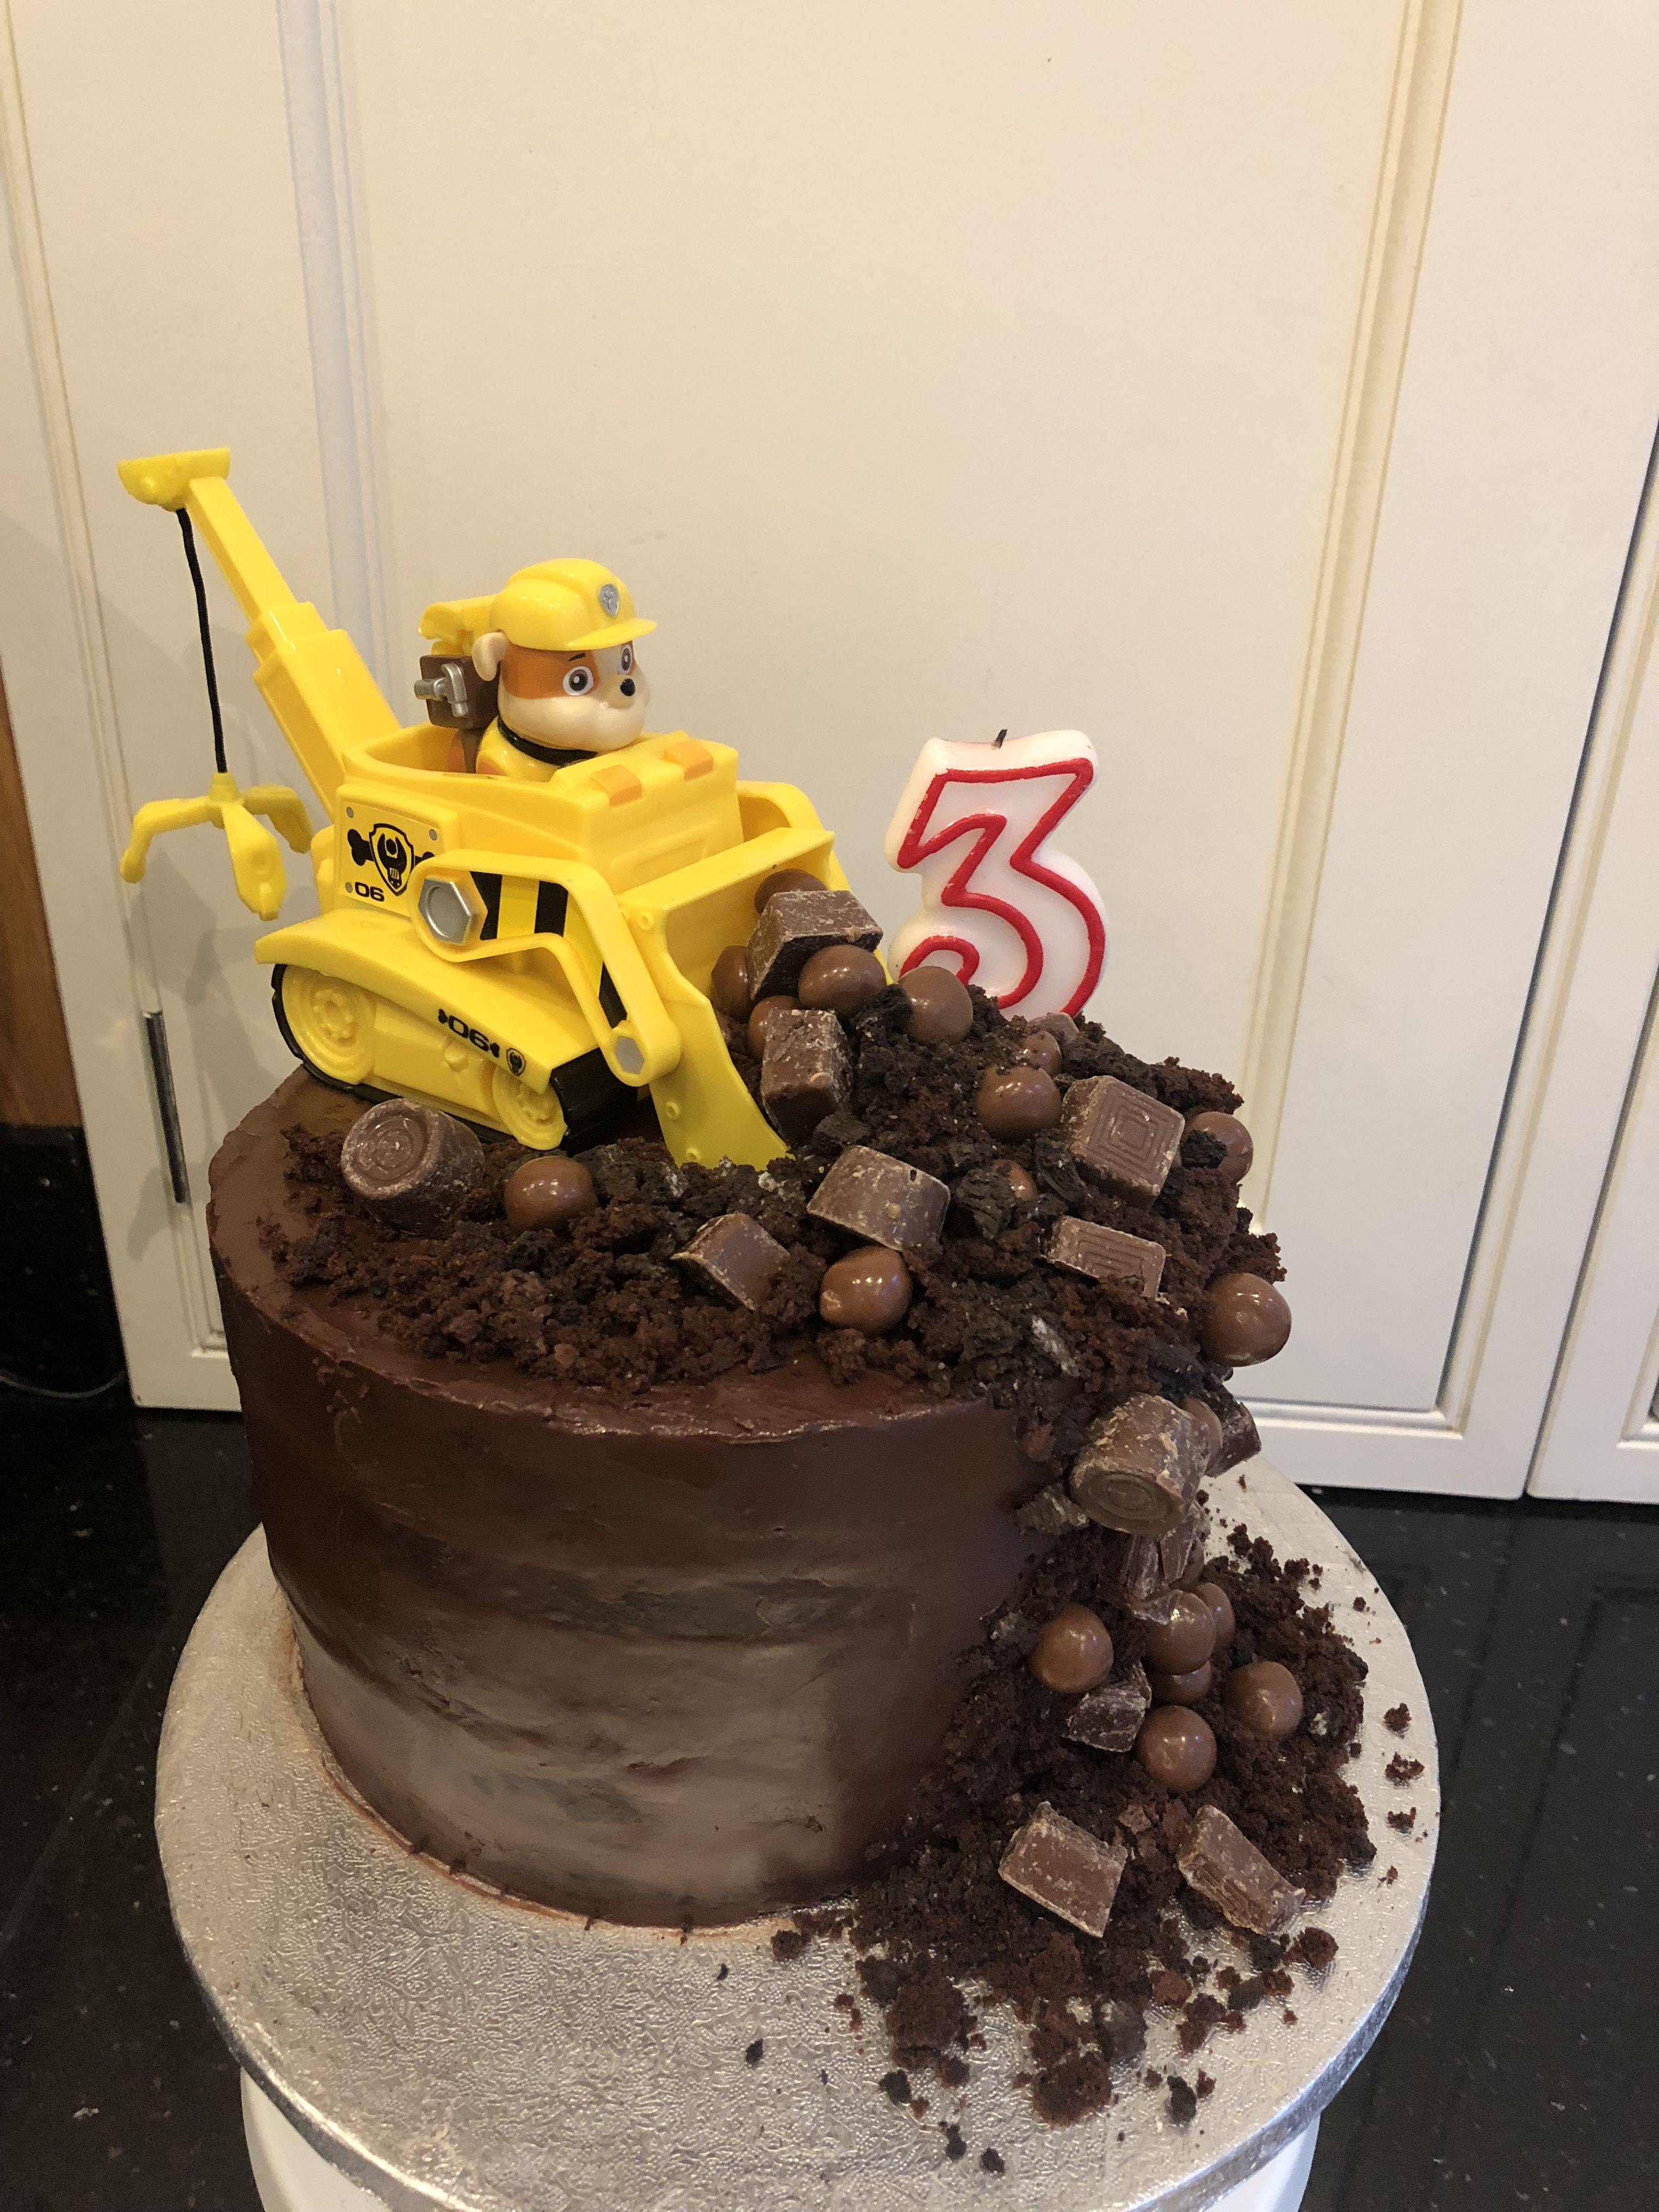 Awe Inspiring 3Rd Birthday Cake Chocolate Salted Caramel Paw Patrol Rubble Personalised Birthday Cards Beptaeletsinfo